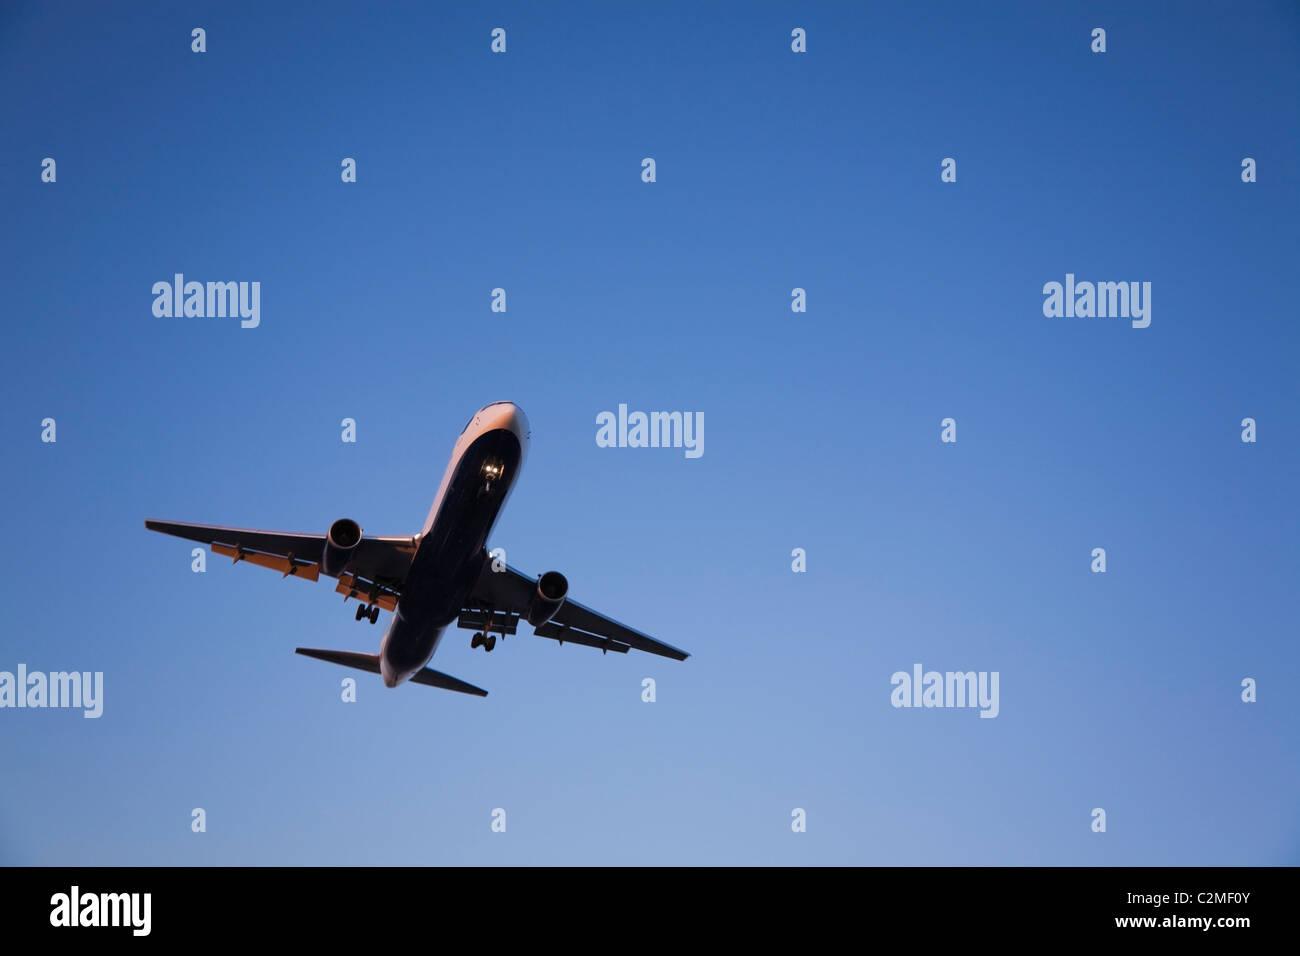 Kommerziellen Jet Flugzeug Landung; Dorval, Quebec, Kanada Stockbild